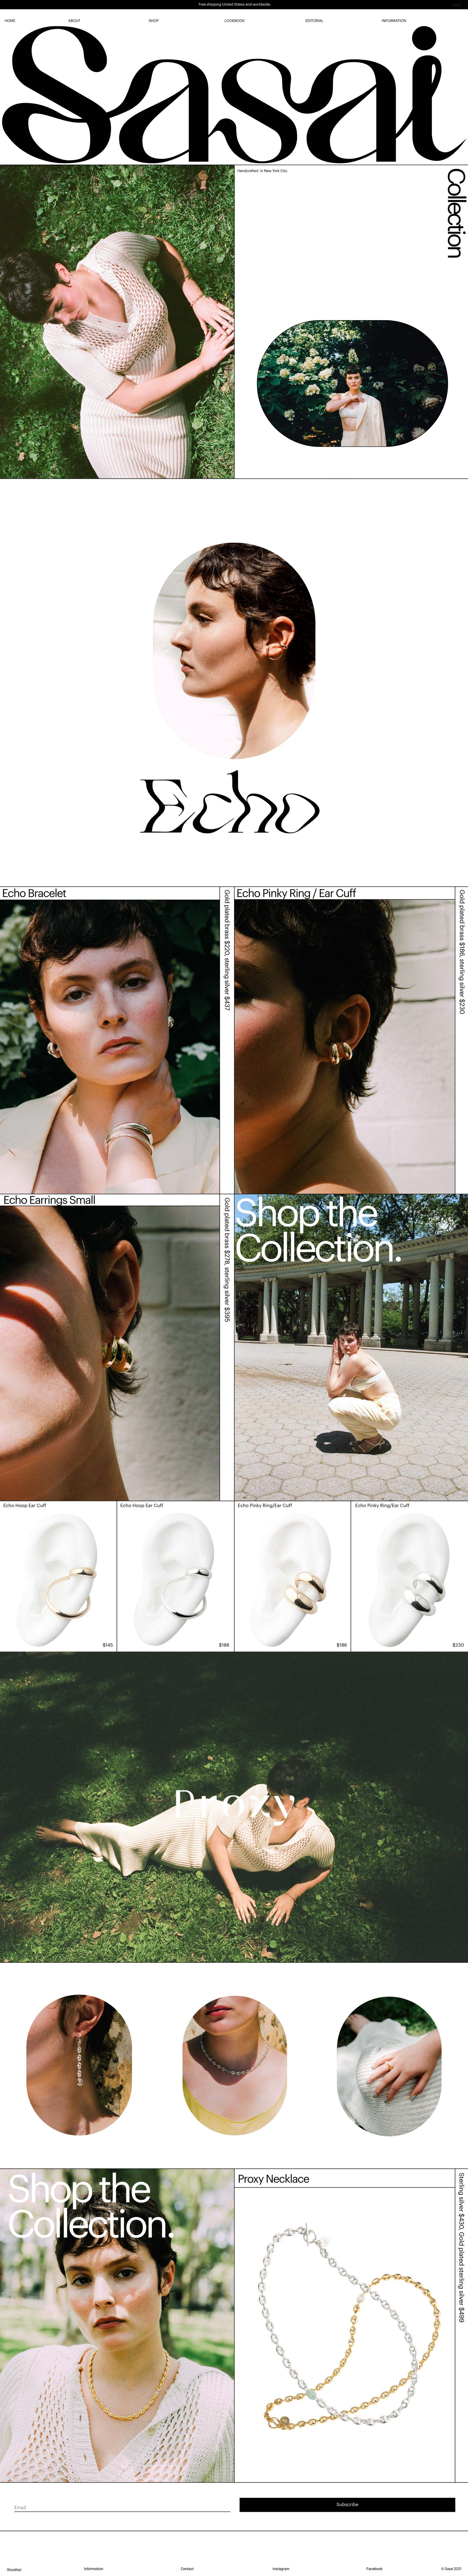 Sasai Jewelry Website - Full Screenshot